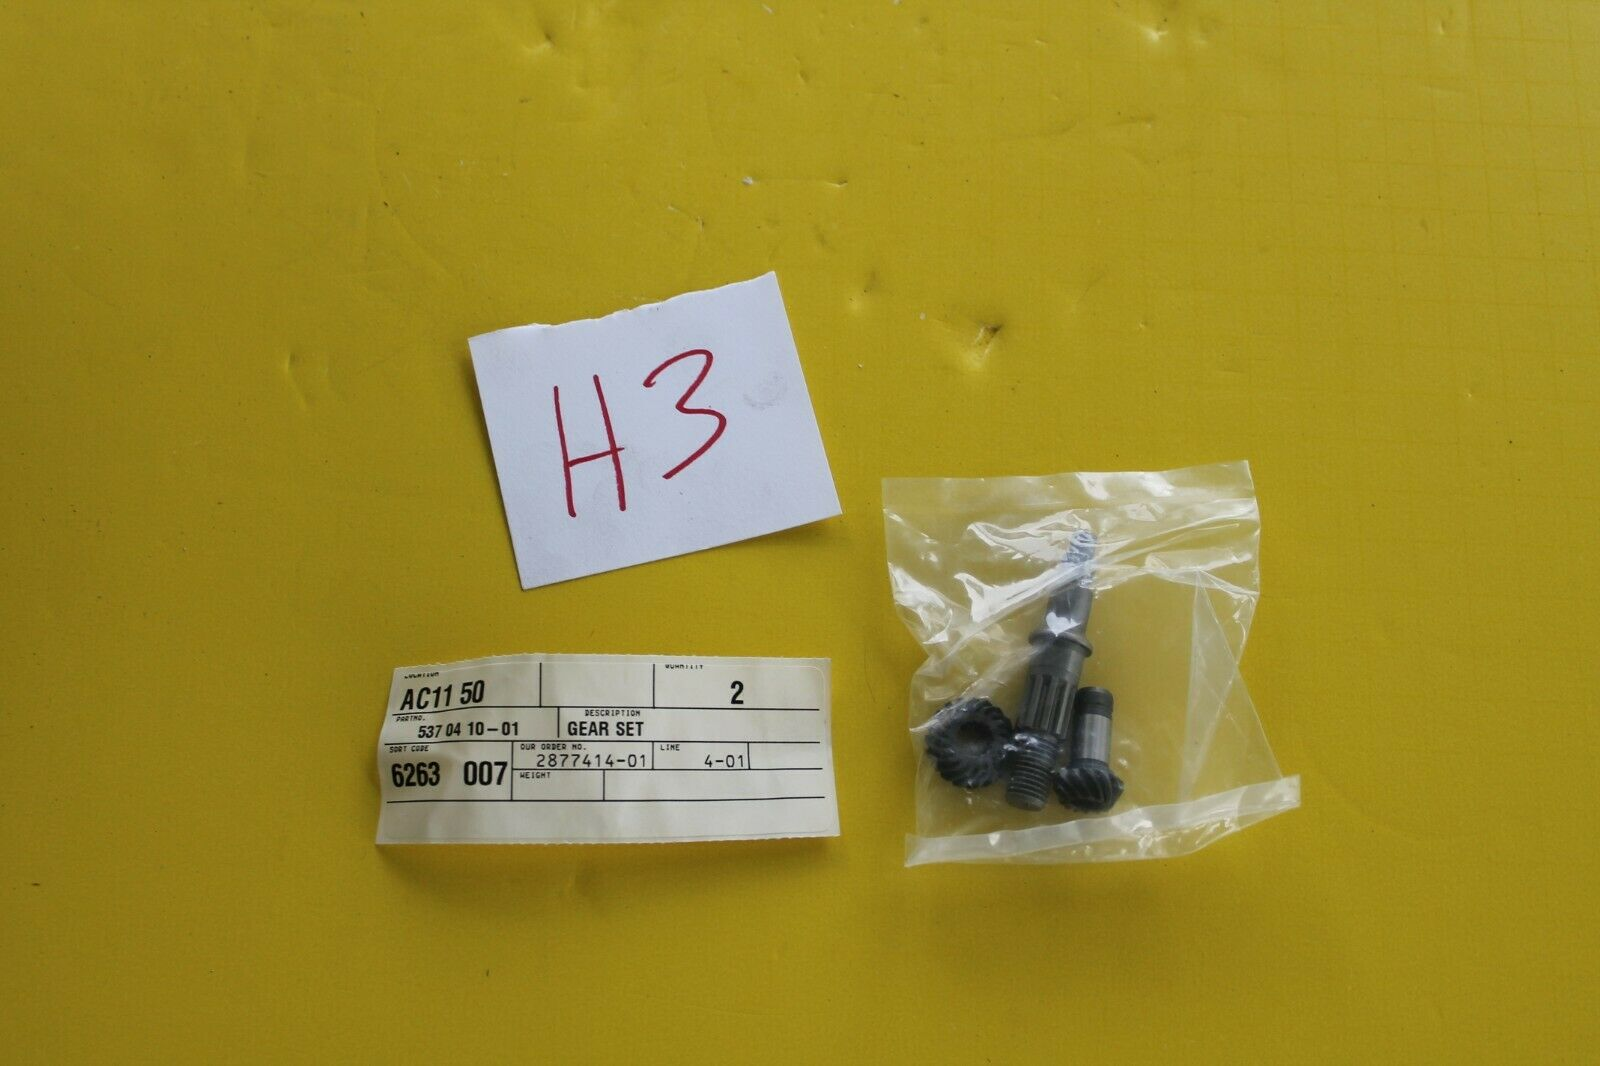 Genuine OEM Husqvarna Gear Set 537041001 Nuevo Viejo Stock